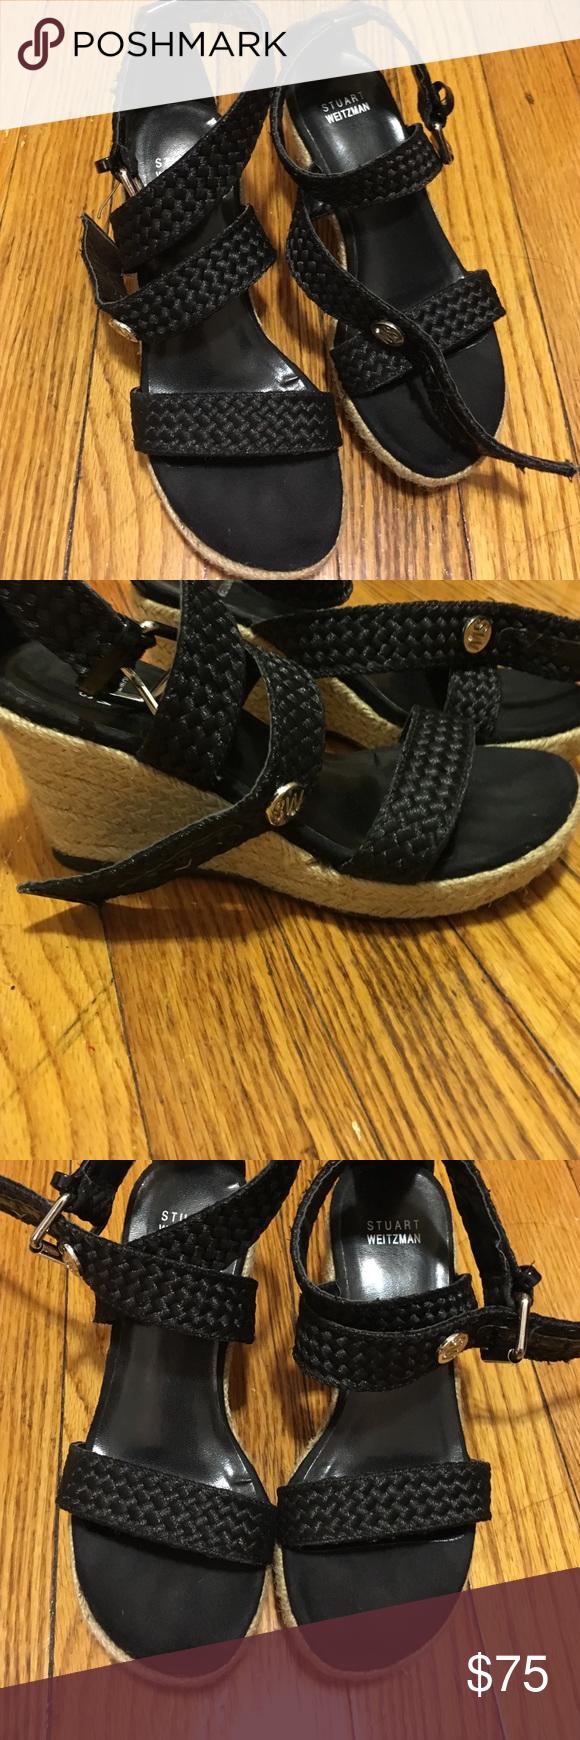 Kids Stuart Weitzman Wedges Black weave wedges Stuart Weitzman Shoes Sandals & Flip Flops